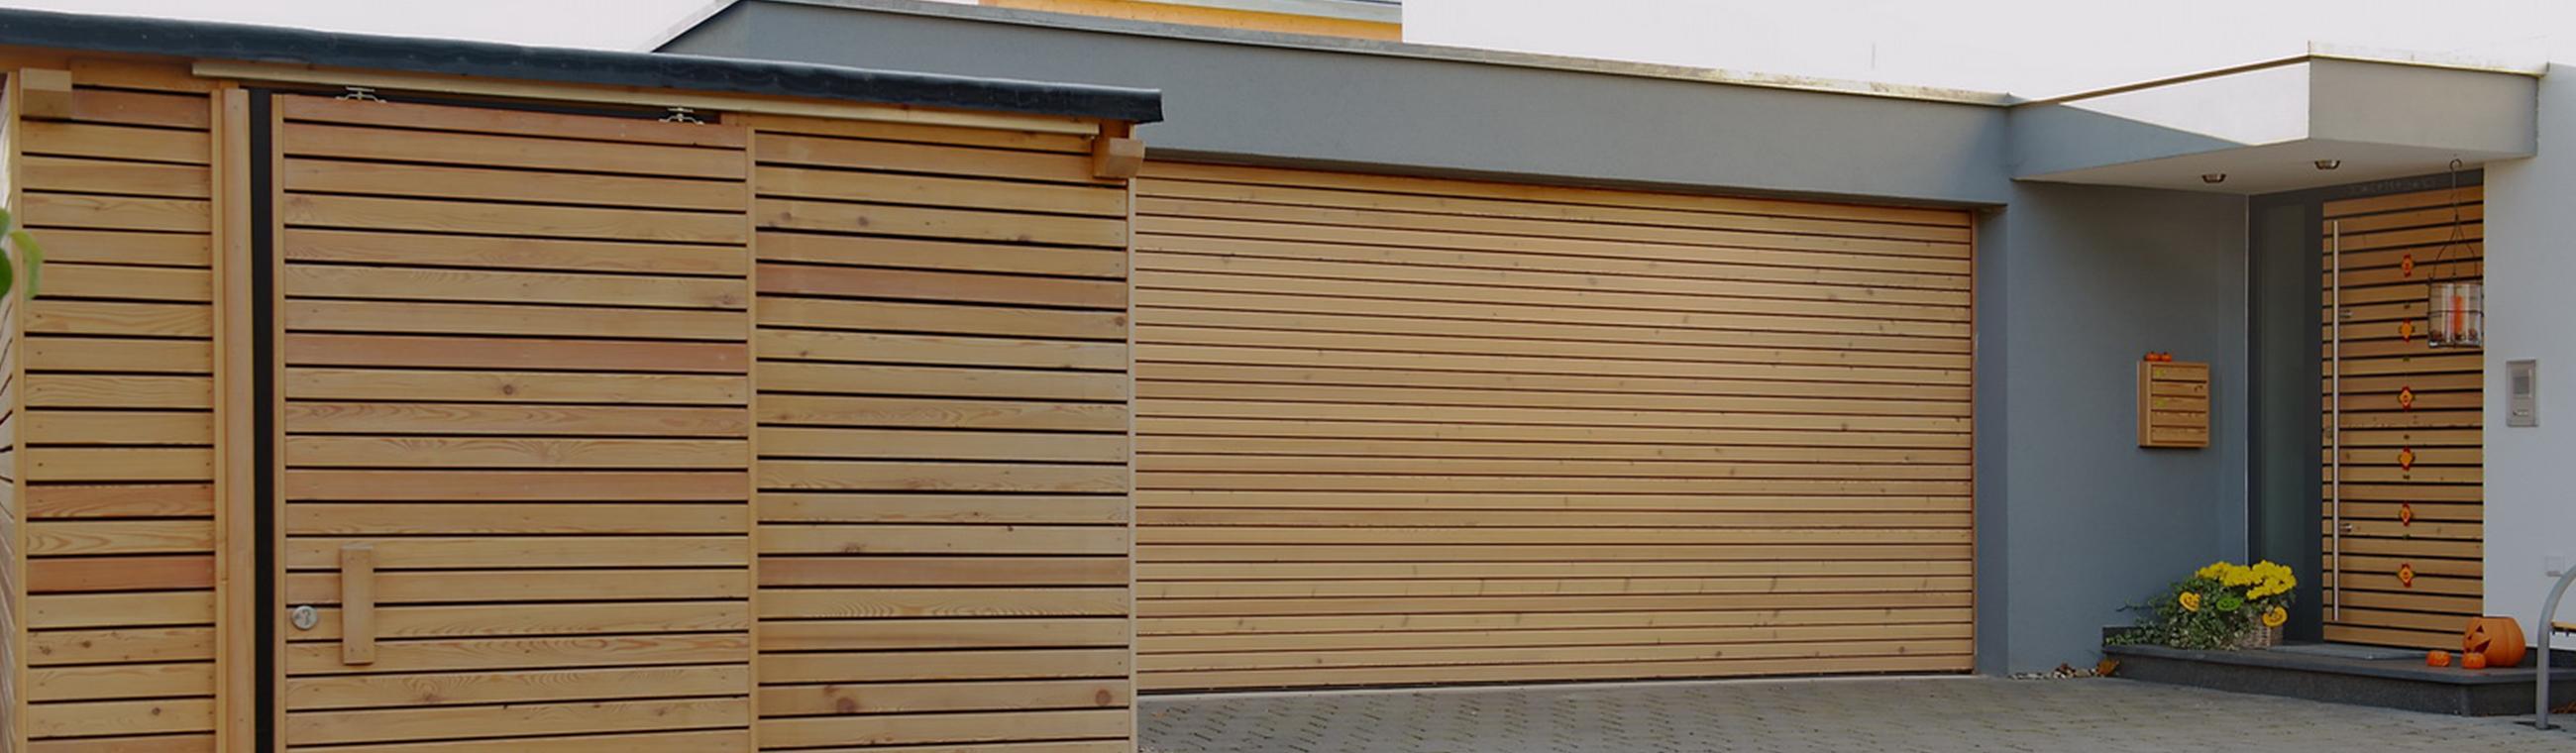 Ruku Illertissen ruku haustüren garagentore hoftore